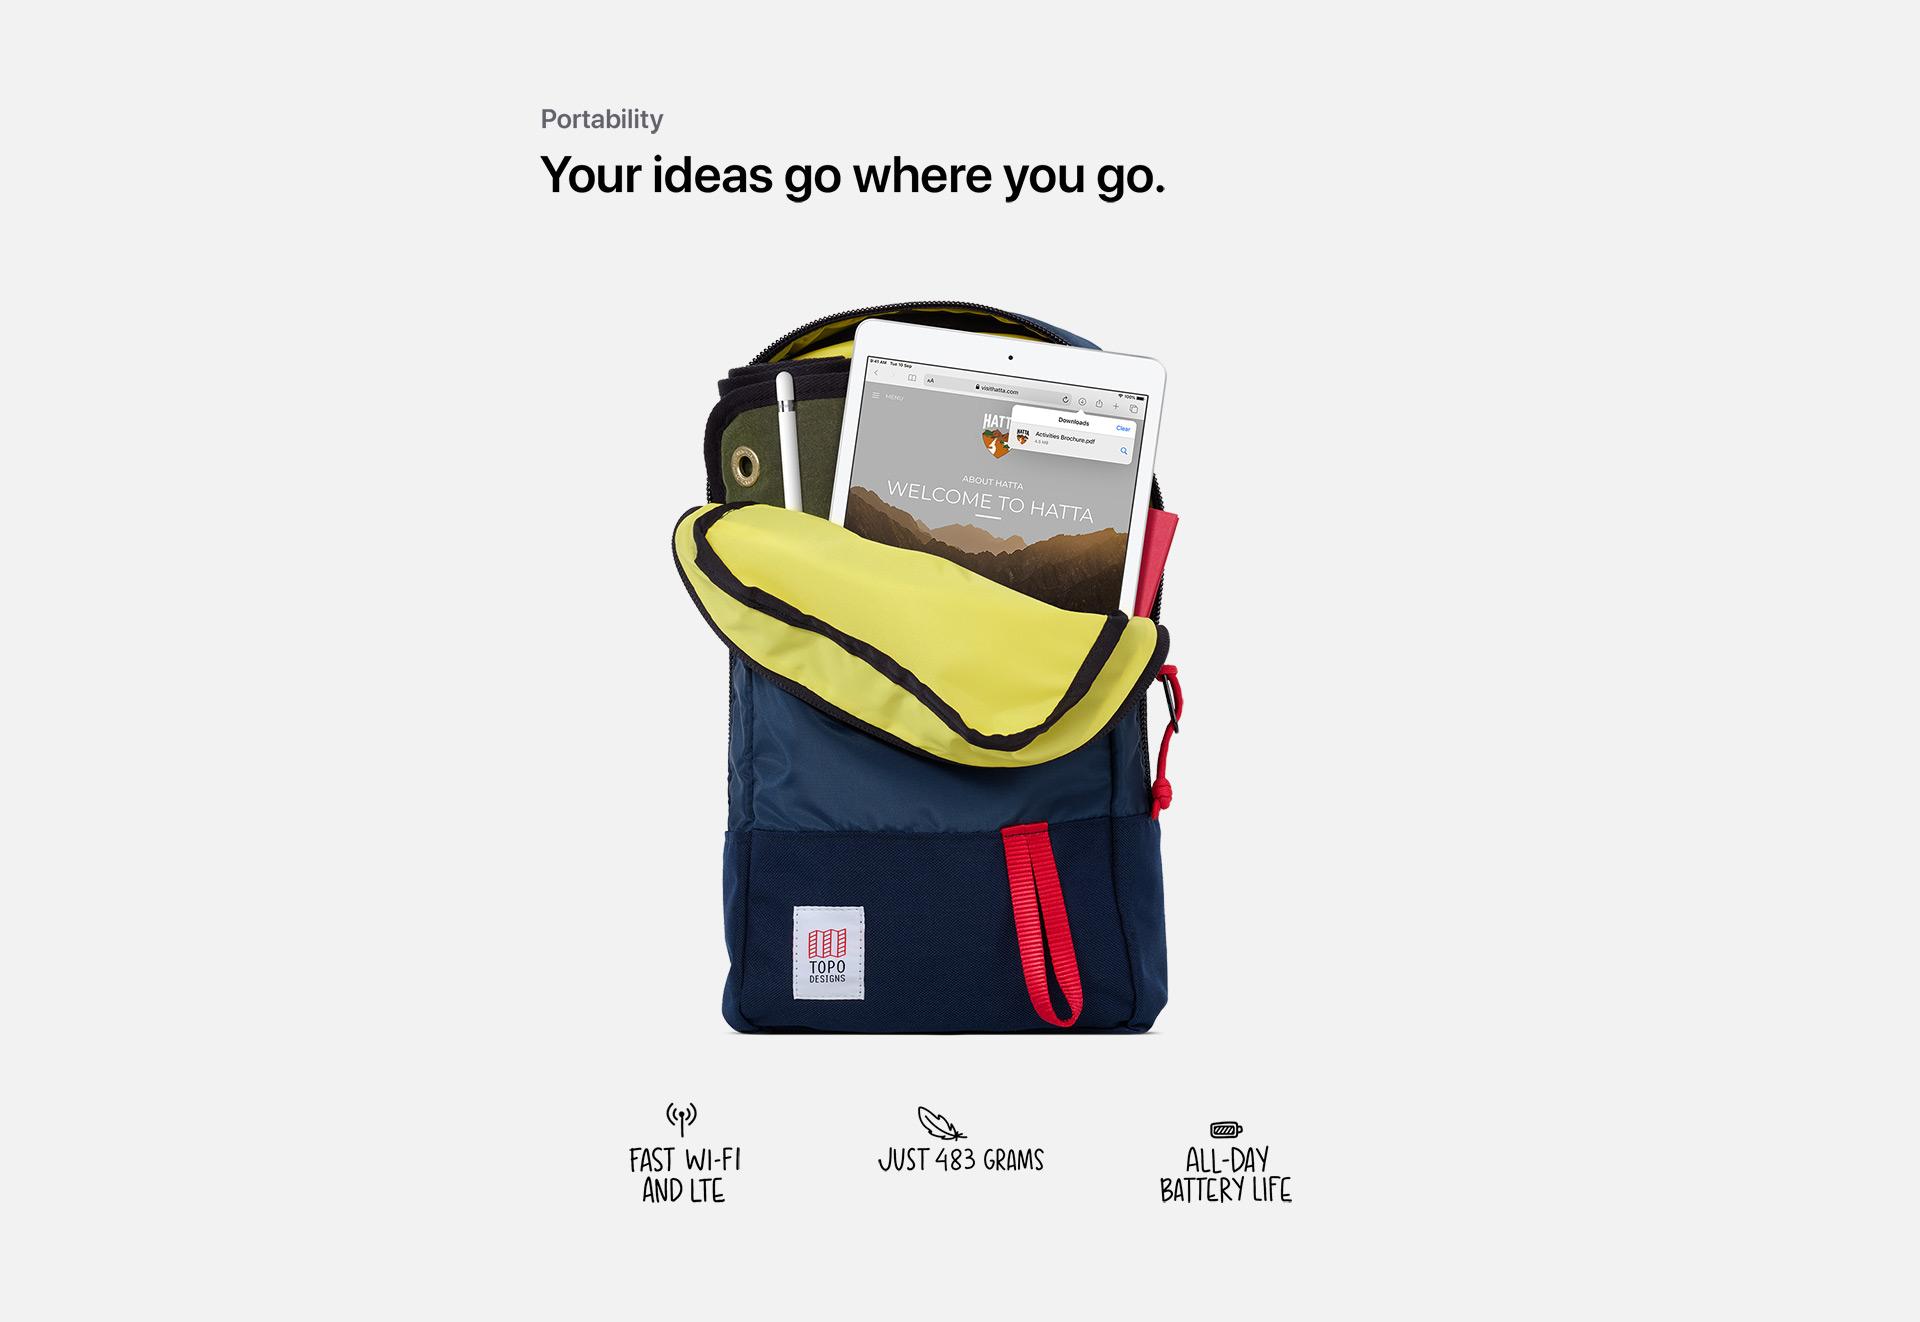 Your ideas go where you go.